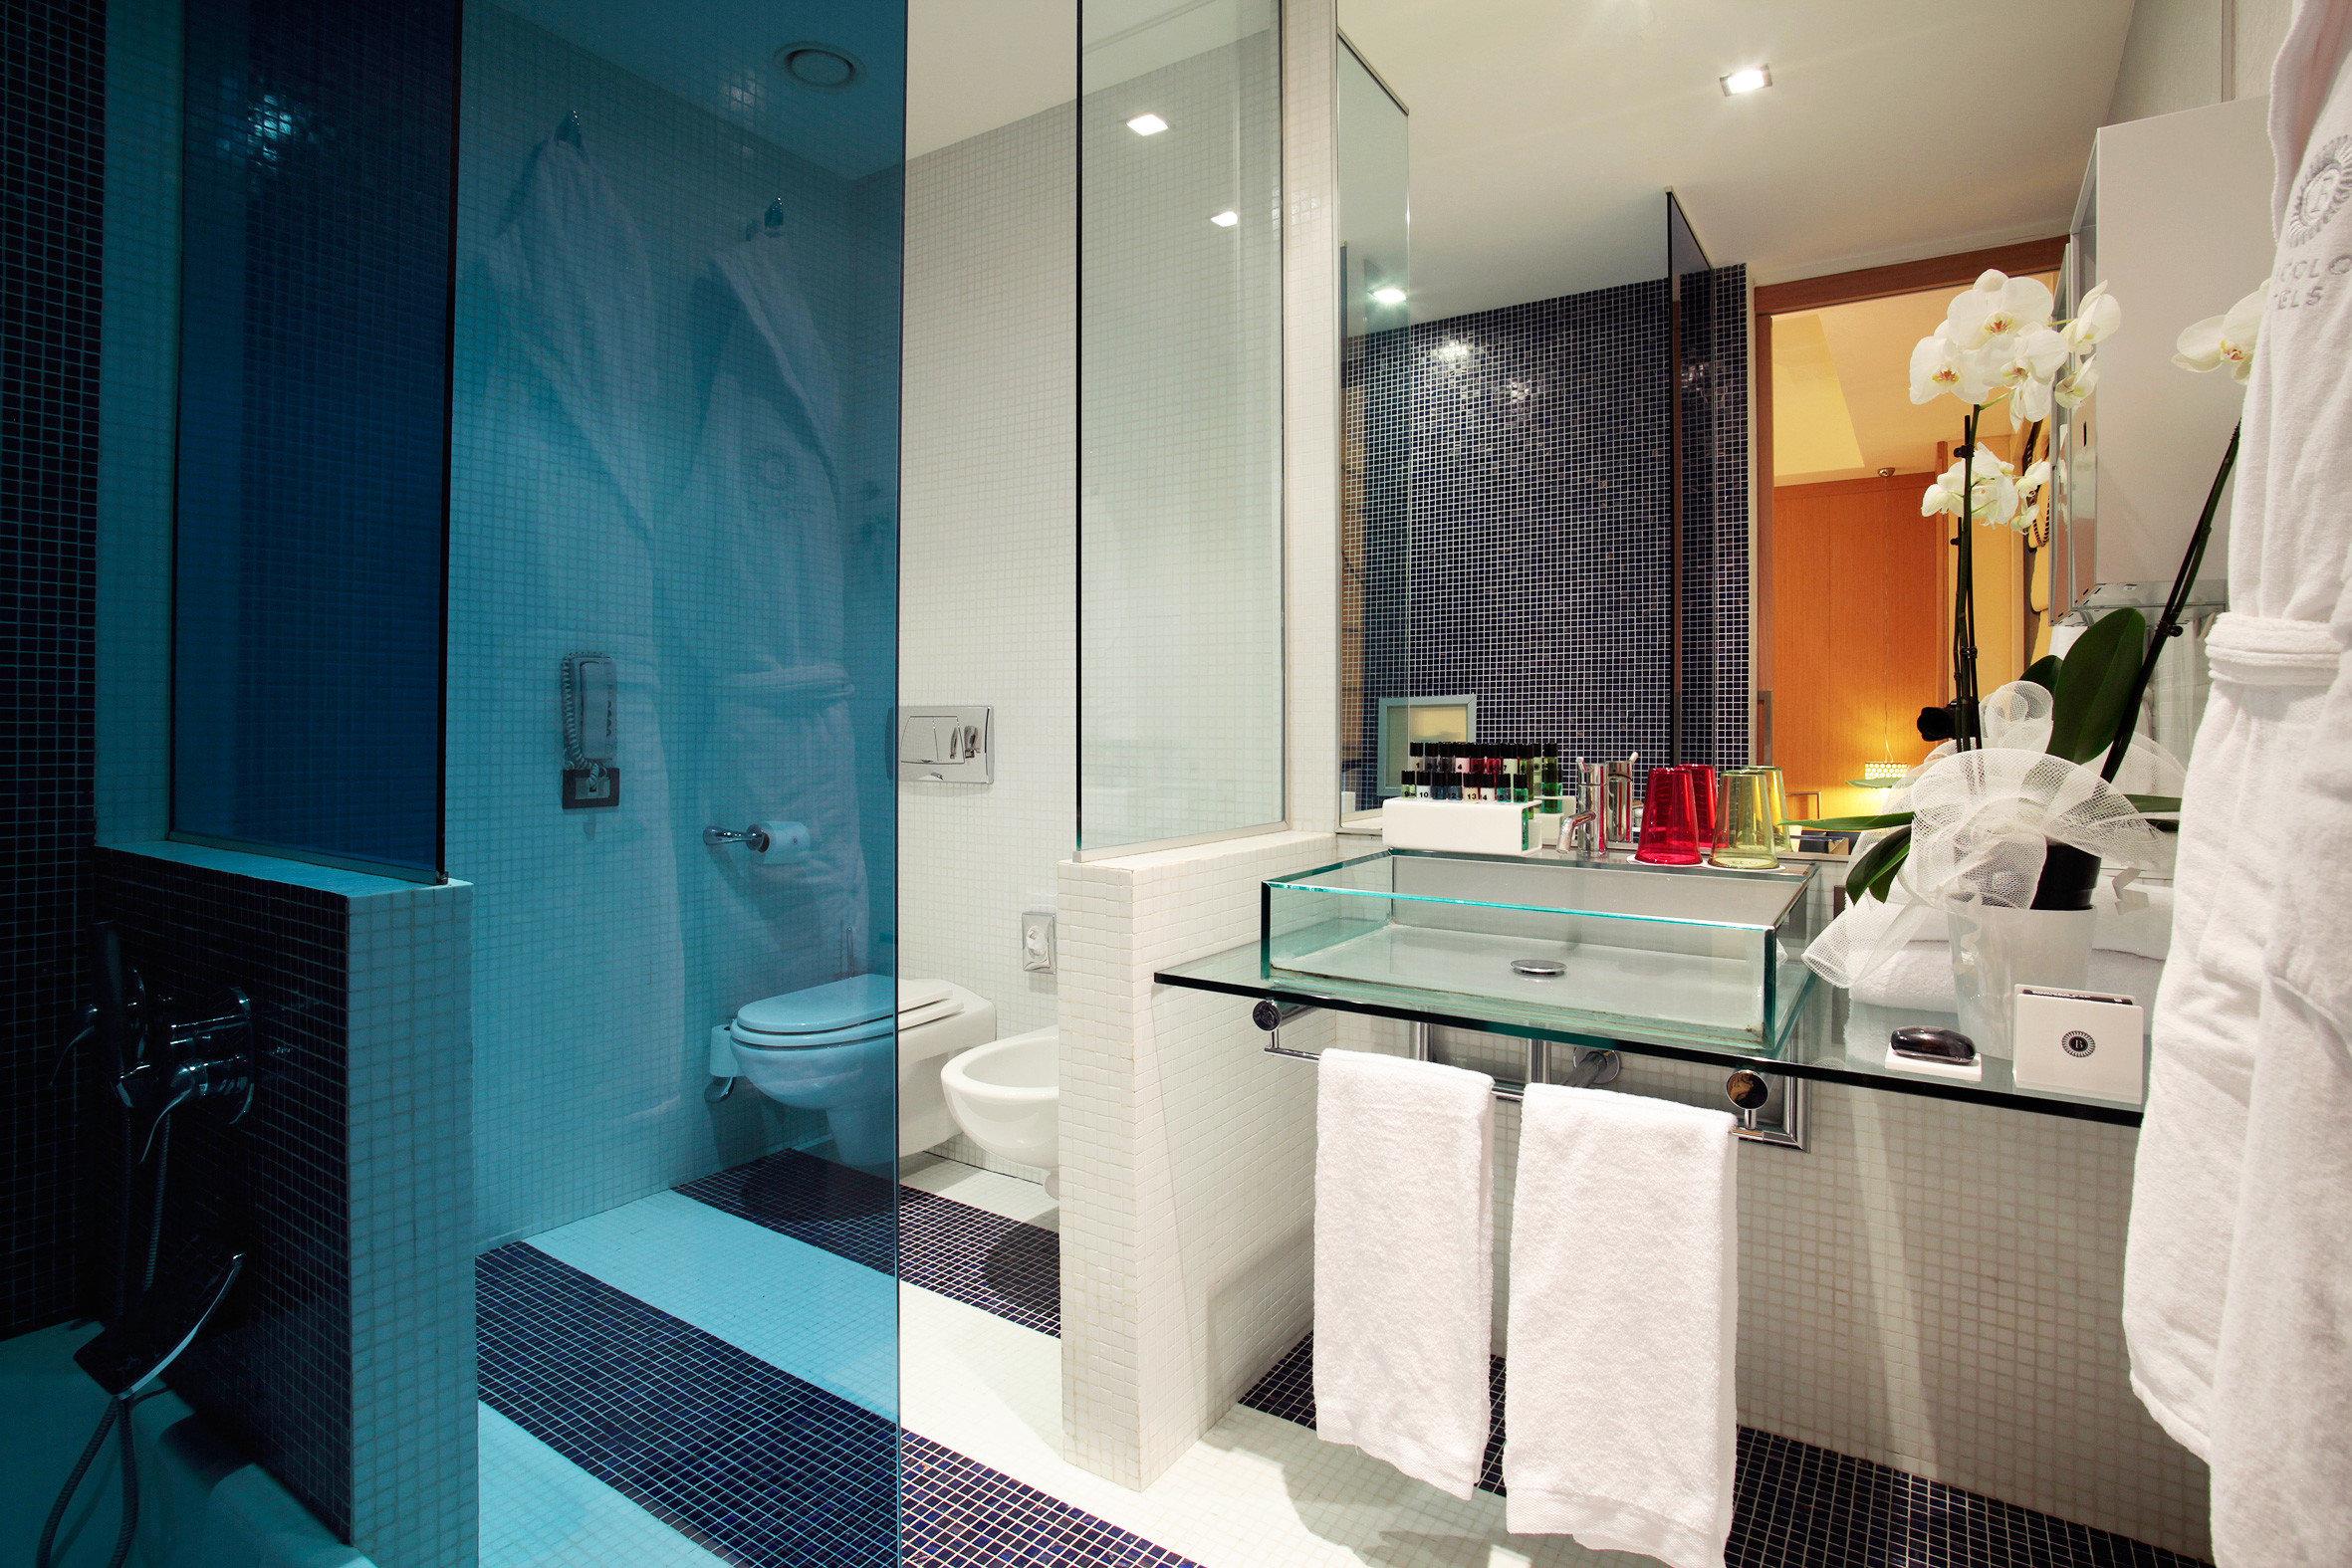 Bath Luxury Modern bathroom mirror property sink Suite white home